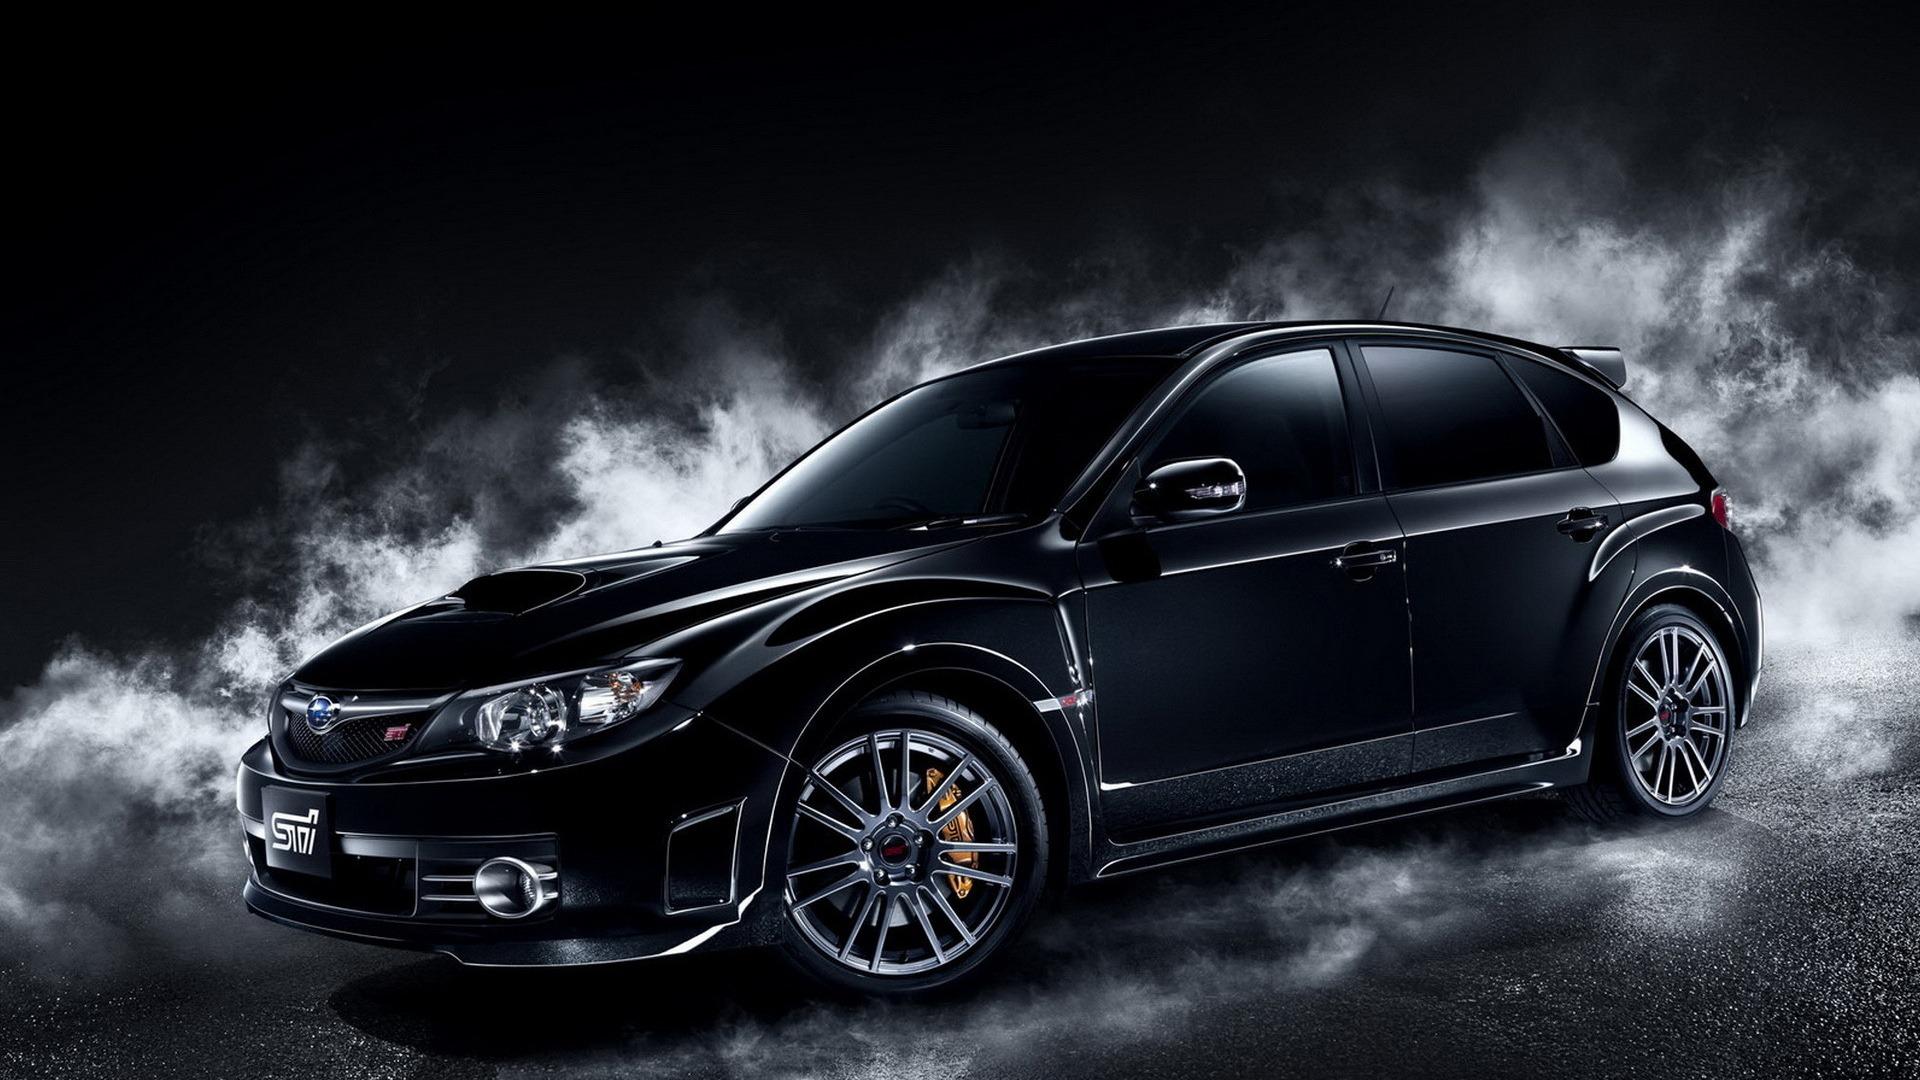 Subaru WRX Wallpaper HD - WallpaperSafari